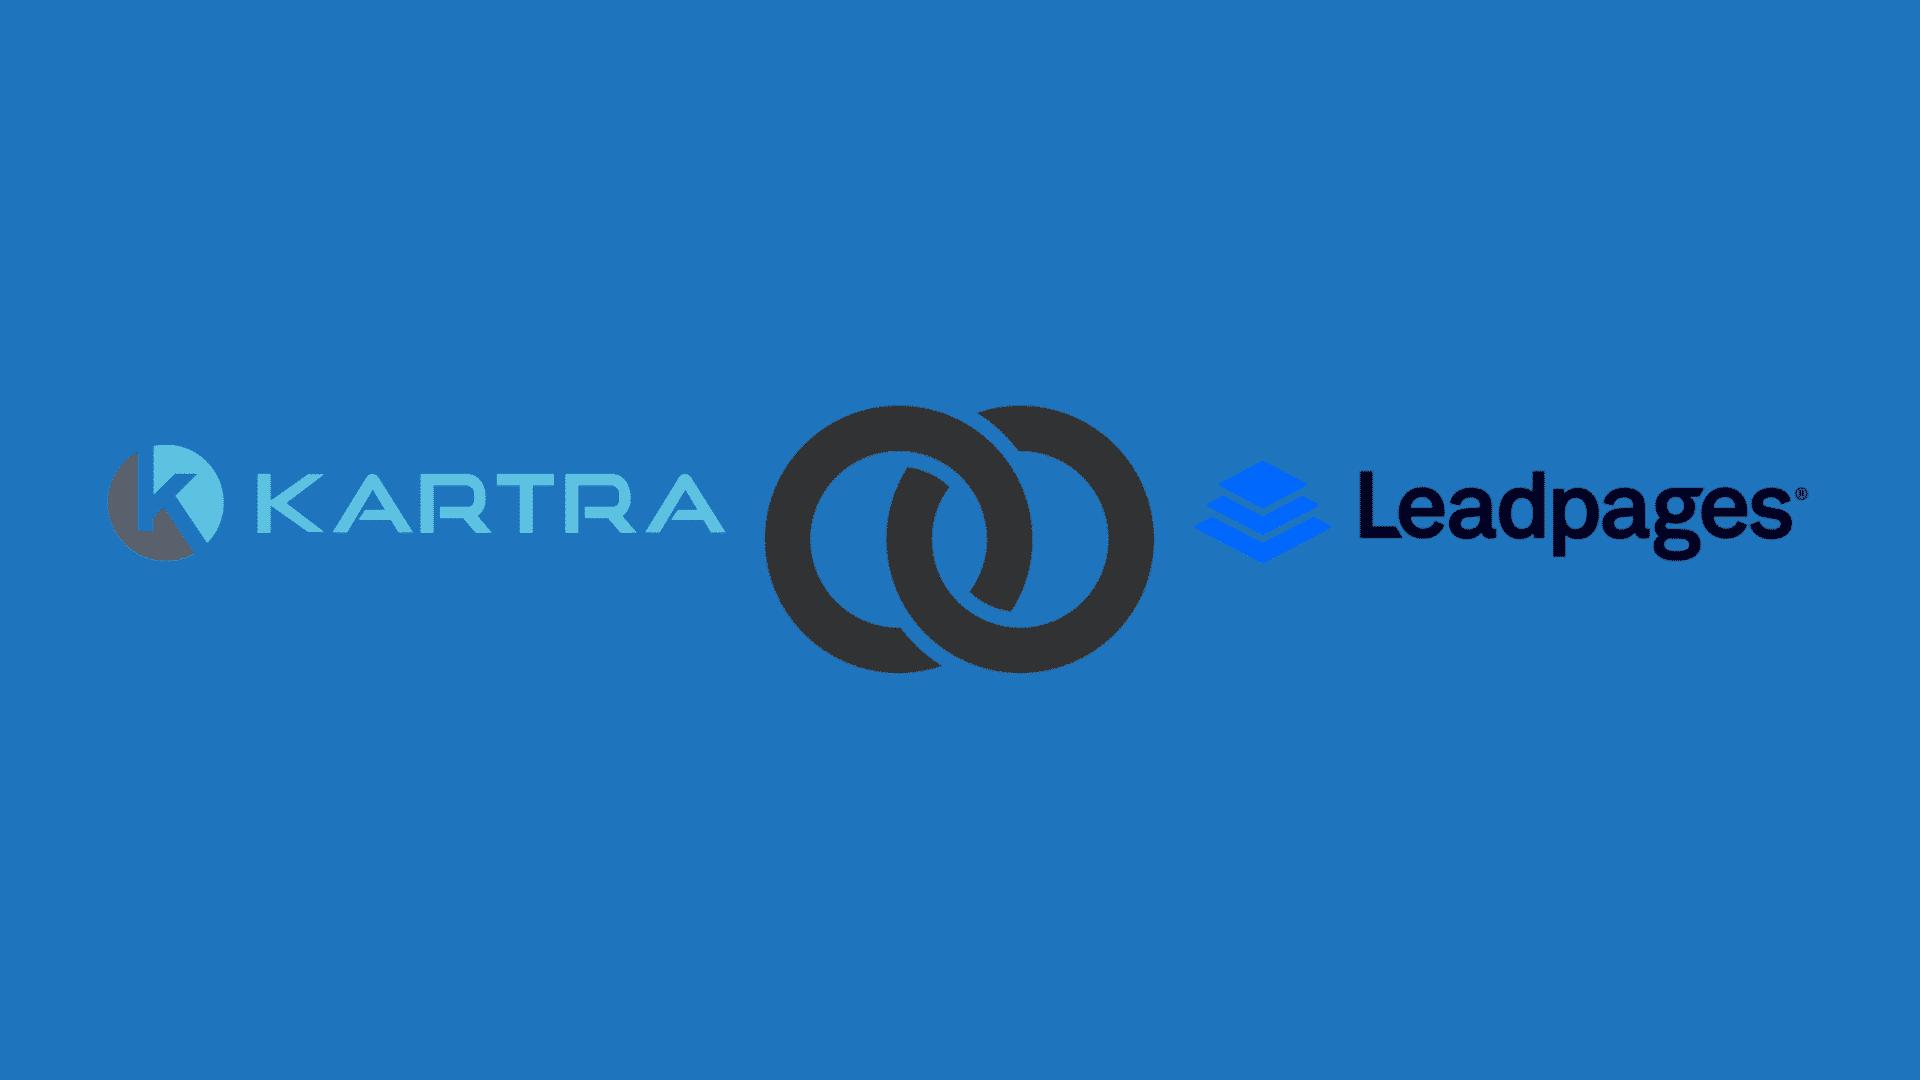 Kartra vs Leadpages – Similarities